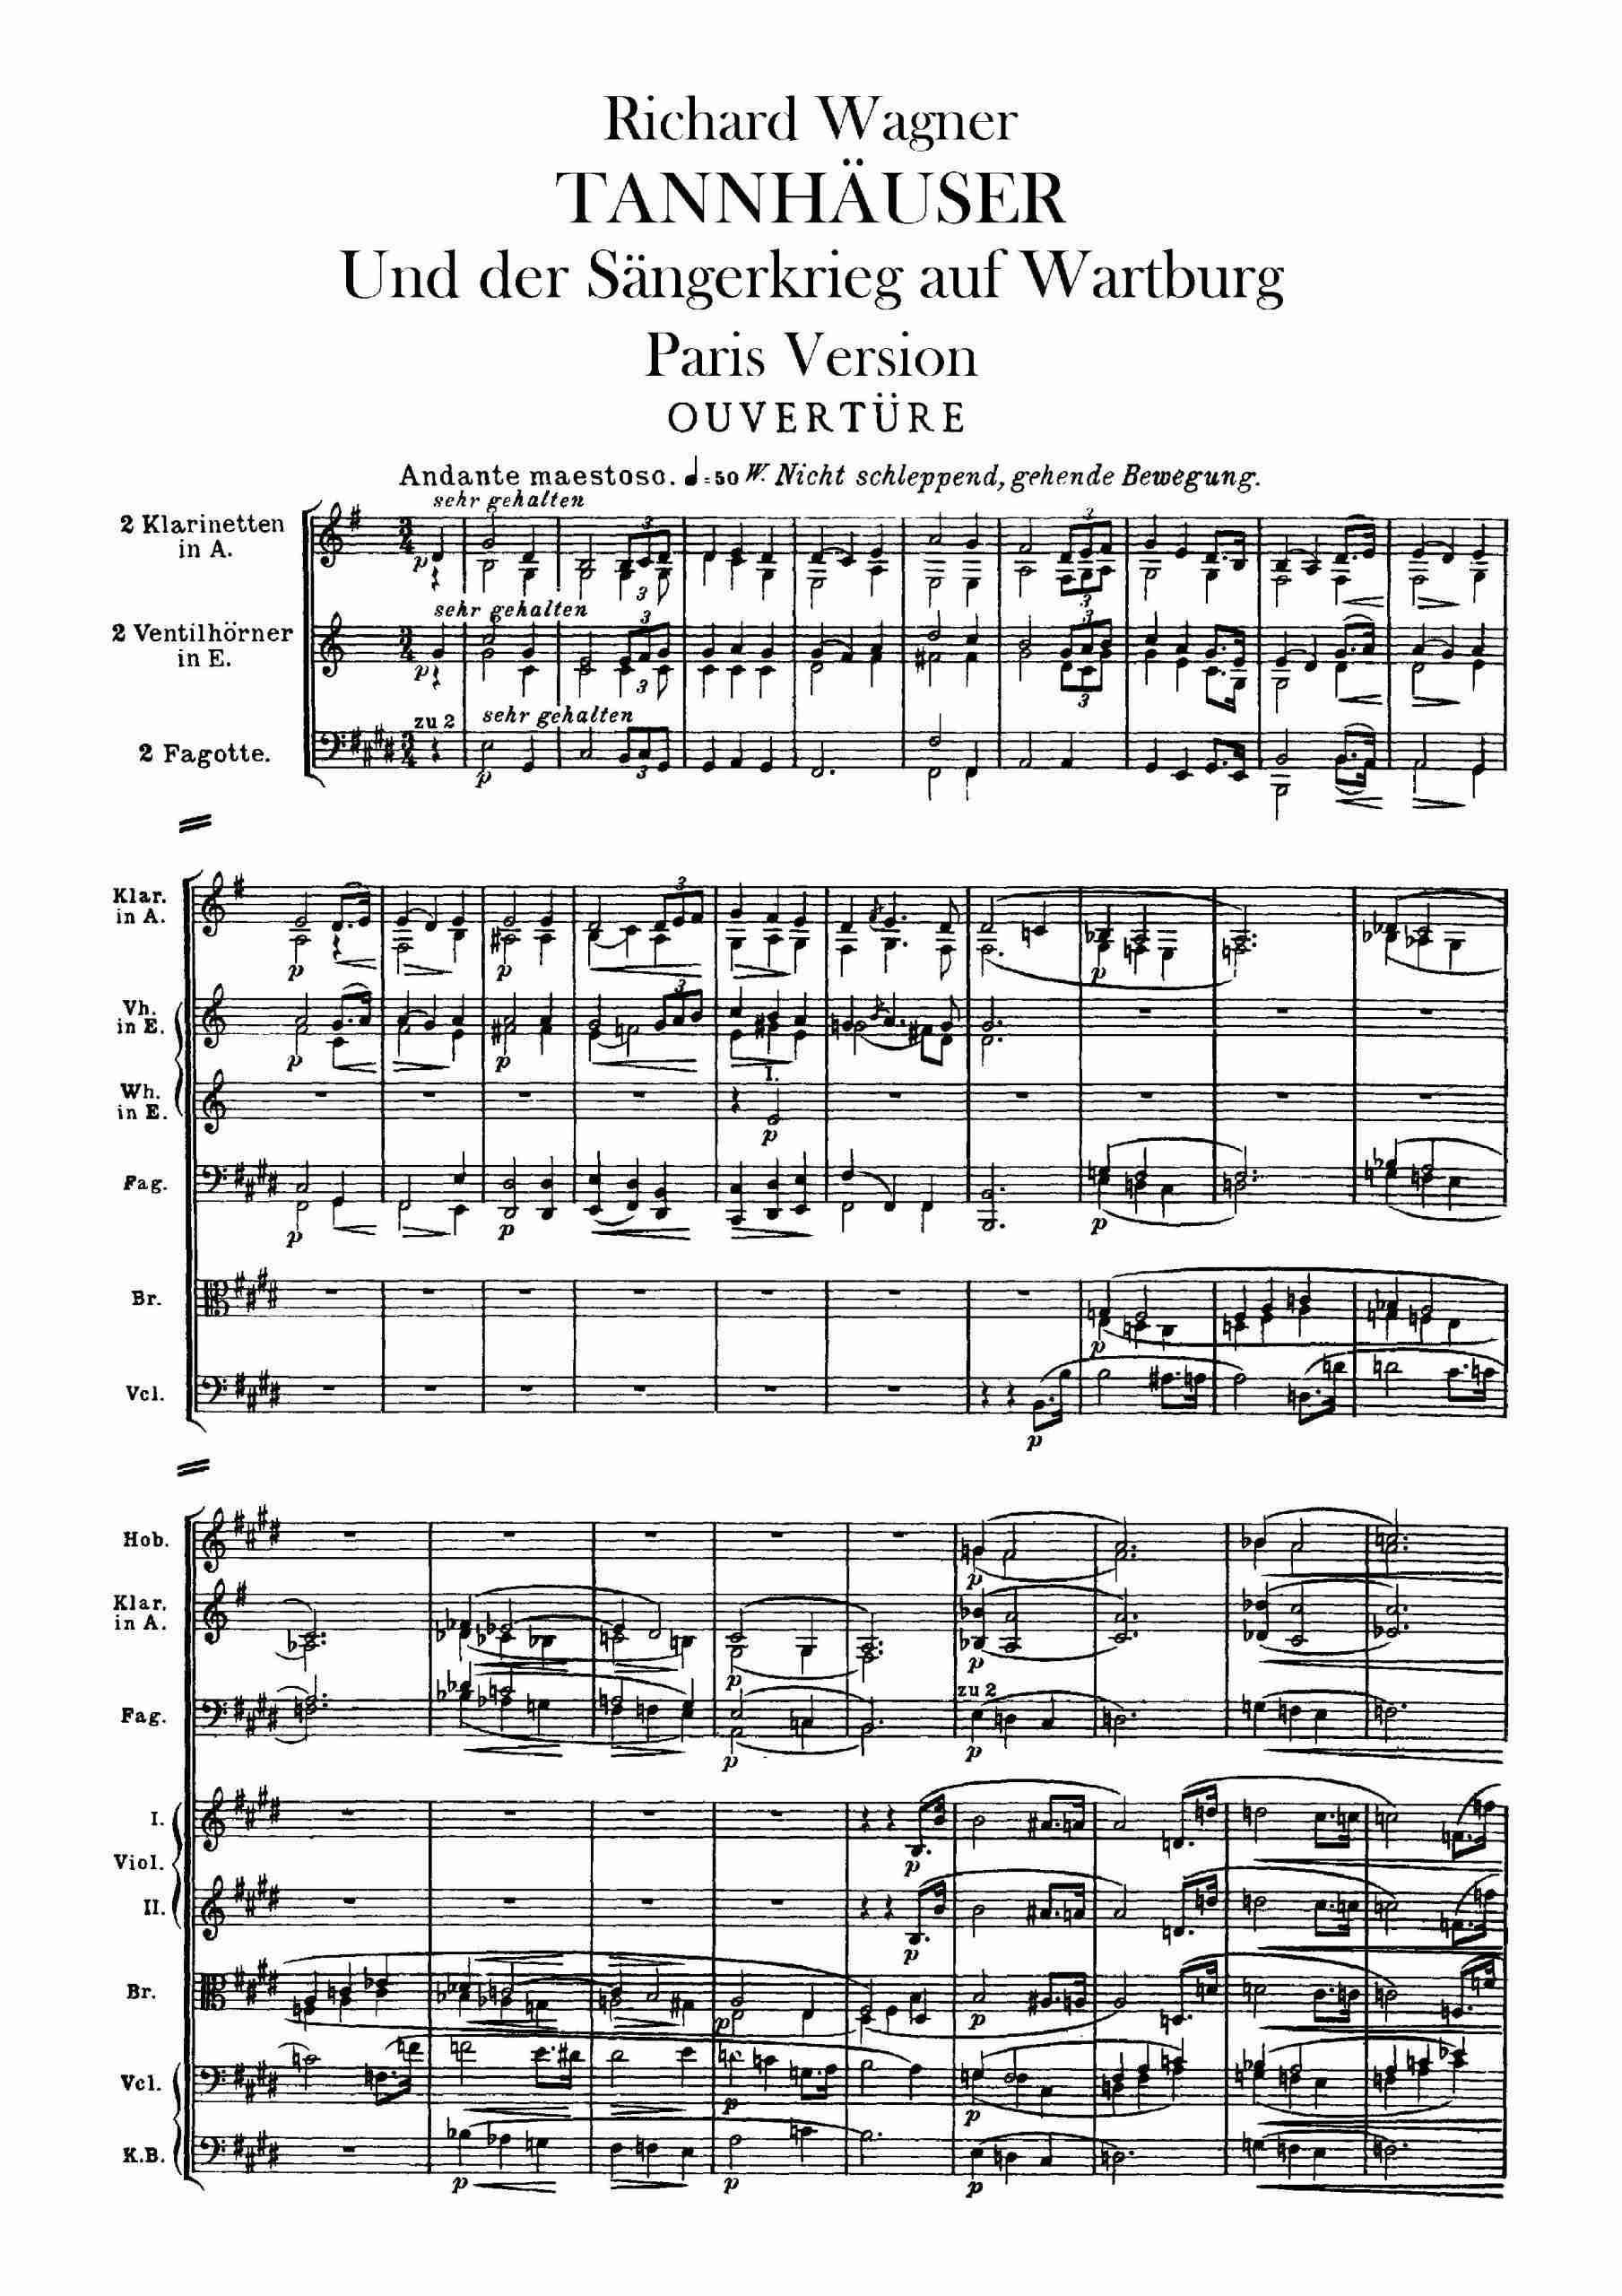 Wagner, Richard - Tannhäuser, WWV 70 (A4 score)